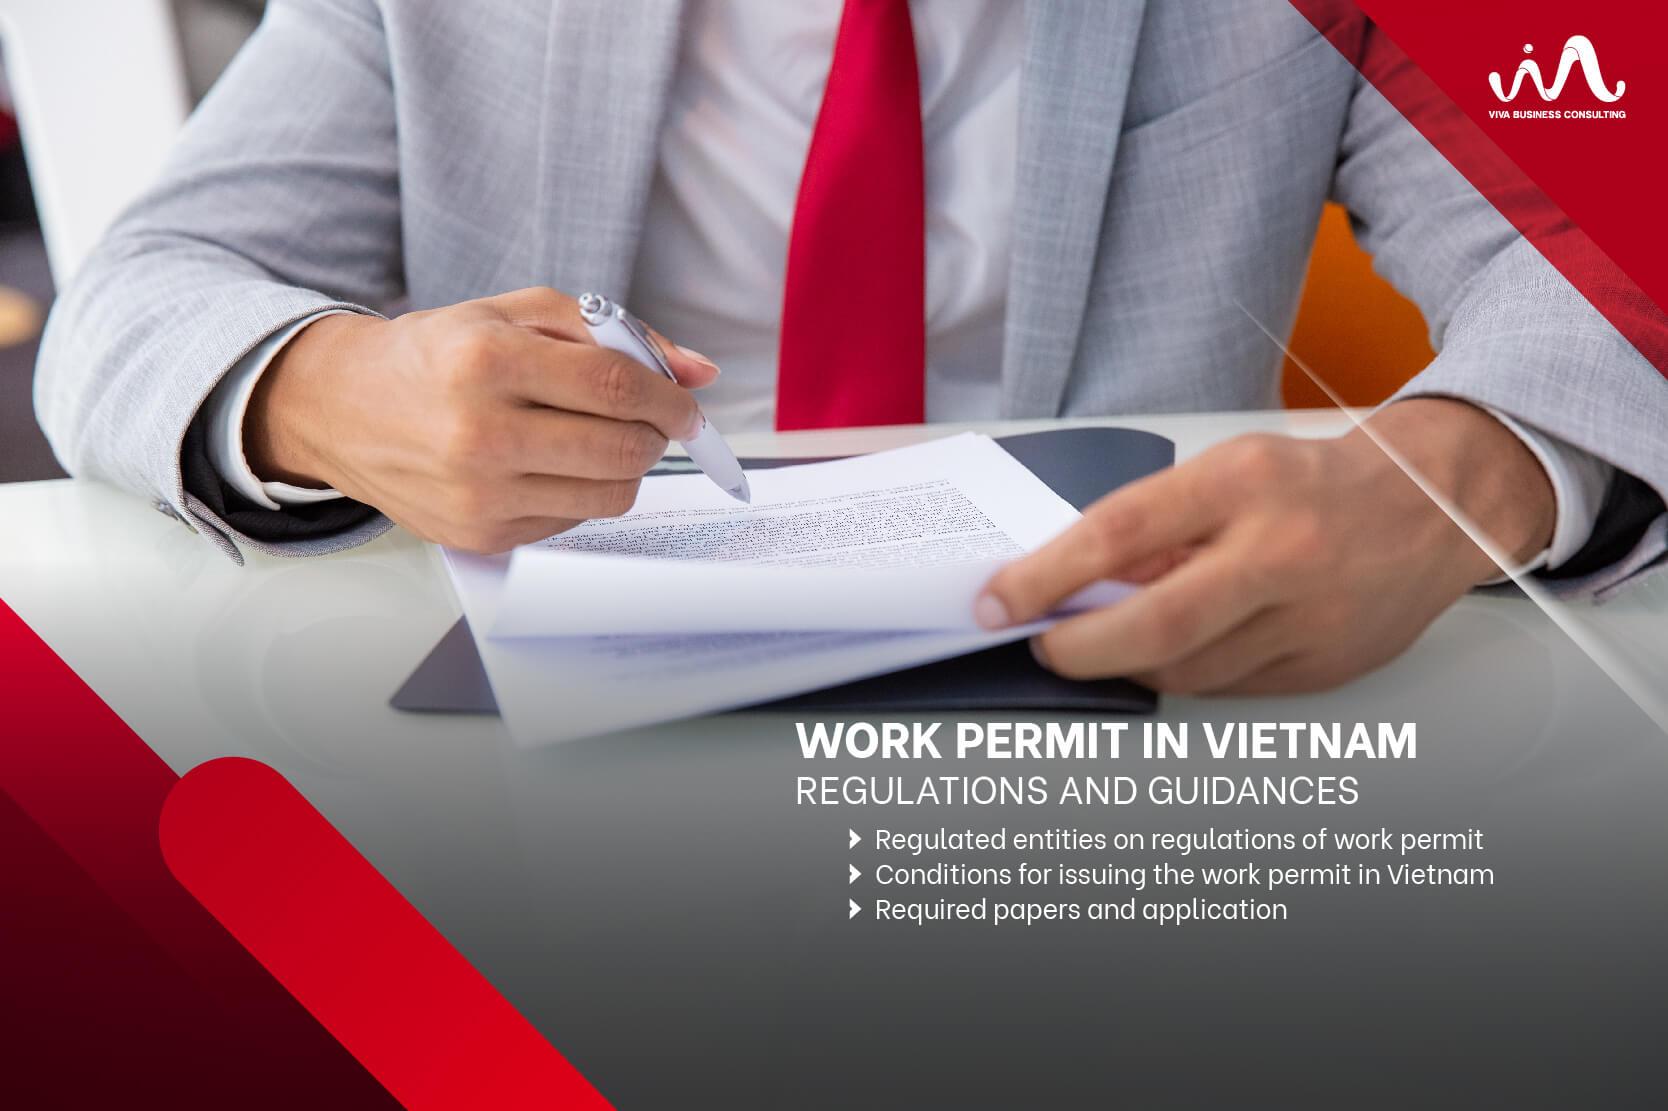 Work Permit in Vietnam - Regulations and guidances